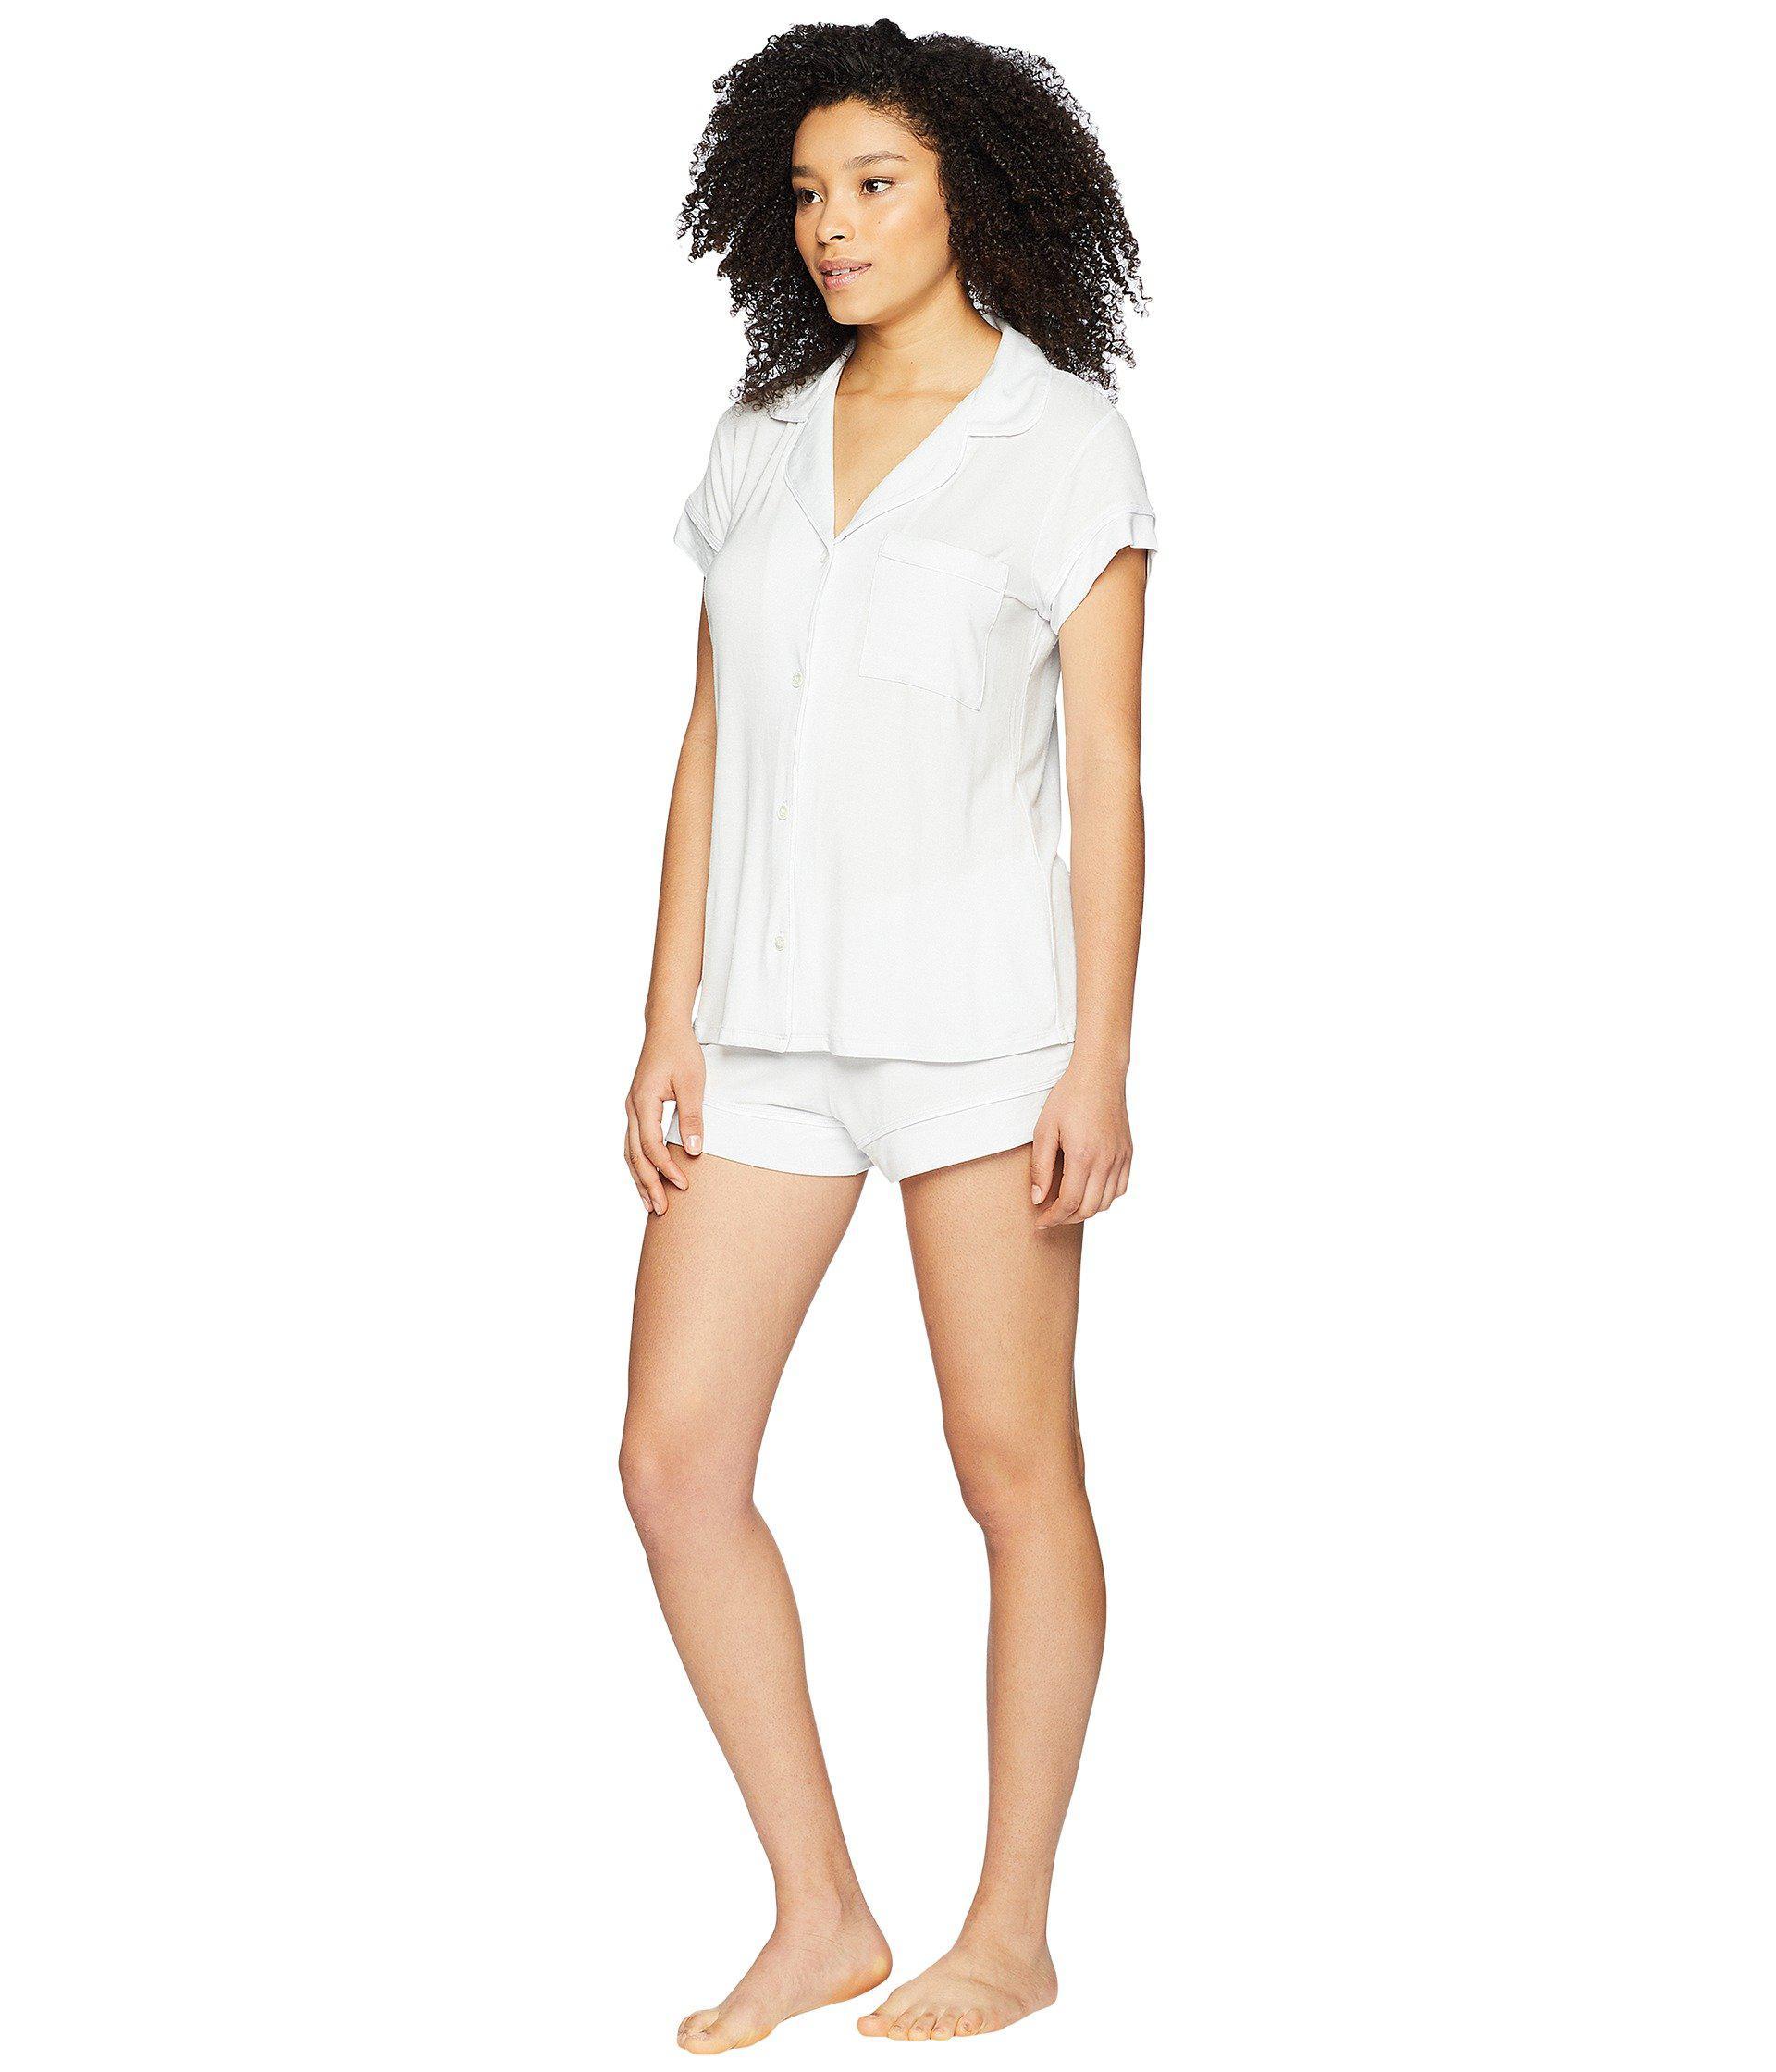 f376c9594 Eberjey Gisele - Basics Short Pj Set (navy ivory) Women s Pajama Sets in  Blue - Lyst